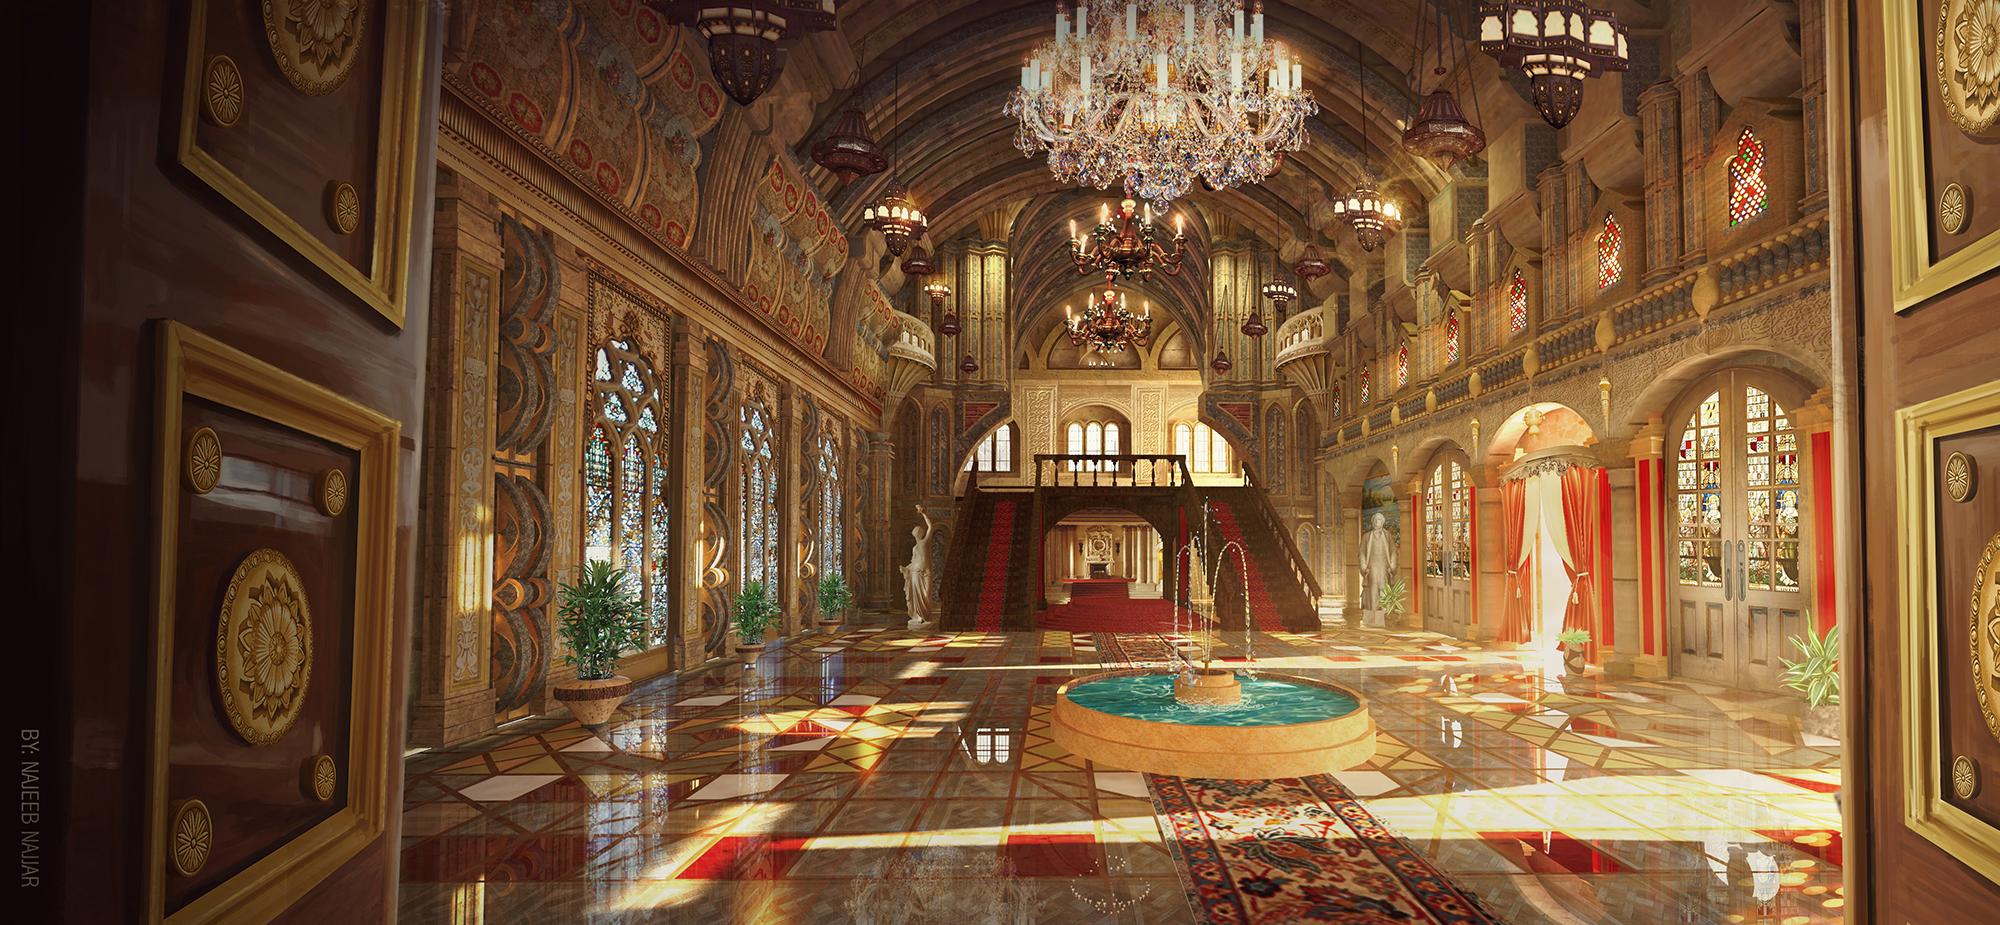 palace by Najeeb-Alnajjar on DeviantArt